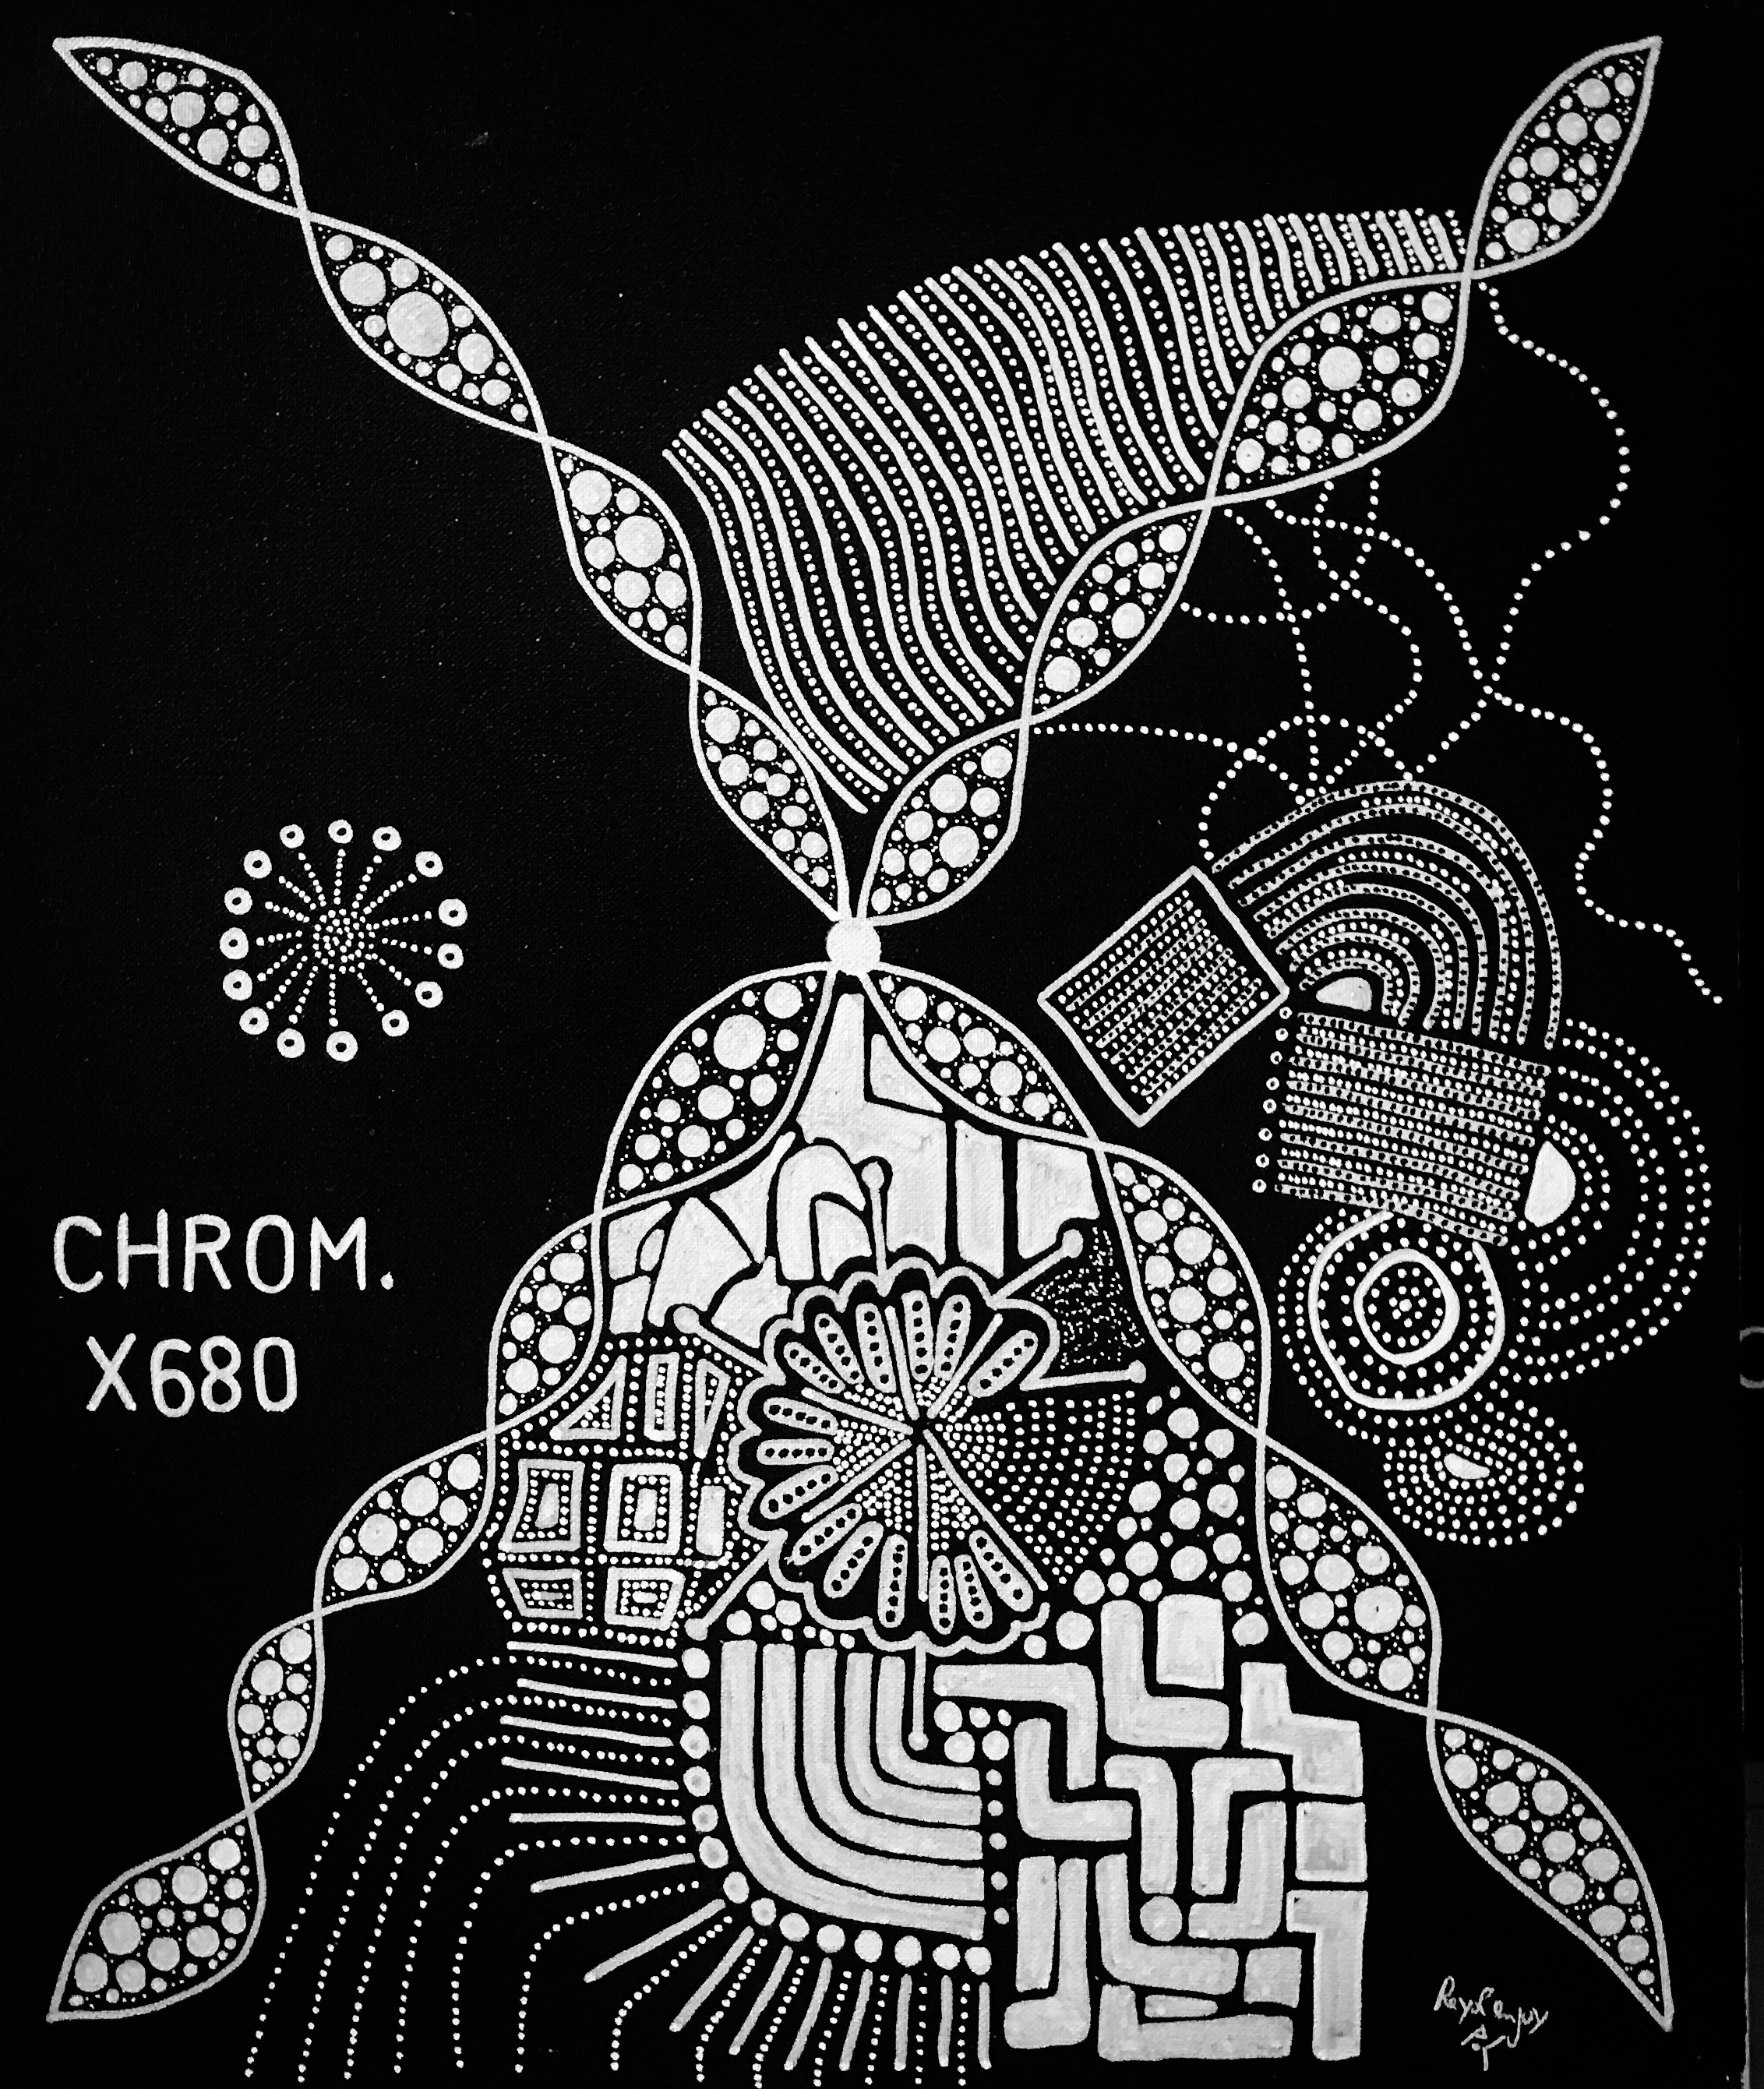 Chrom X680